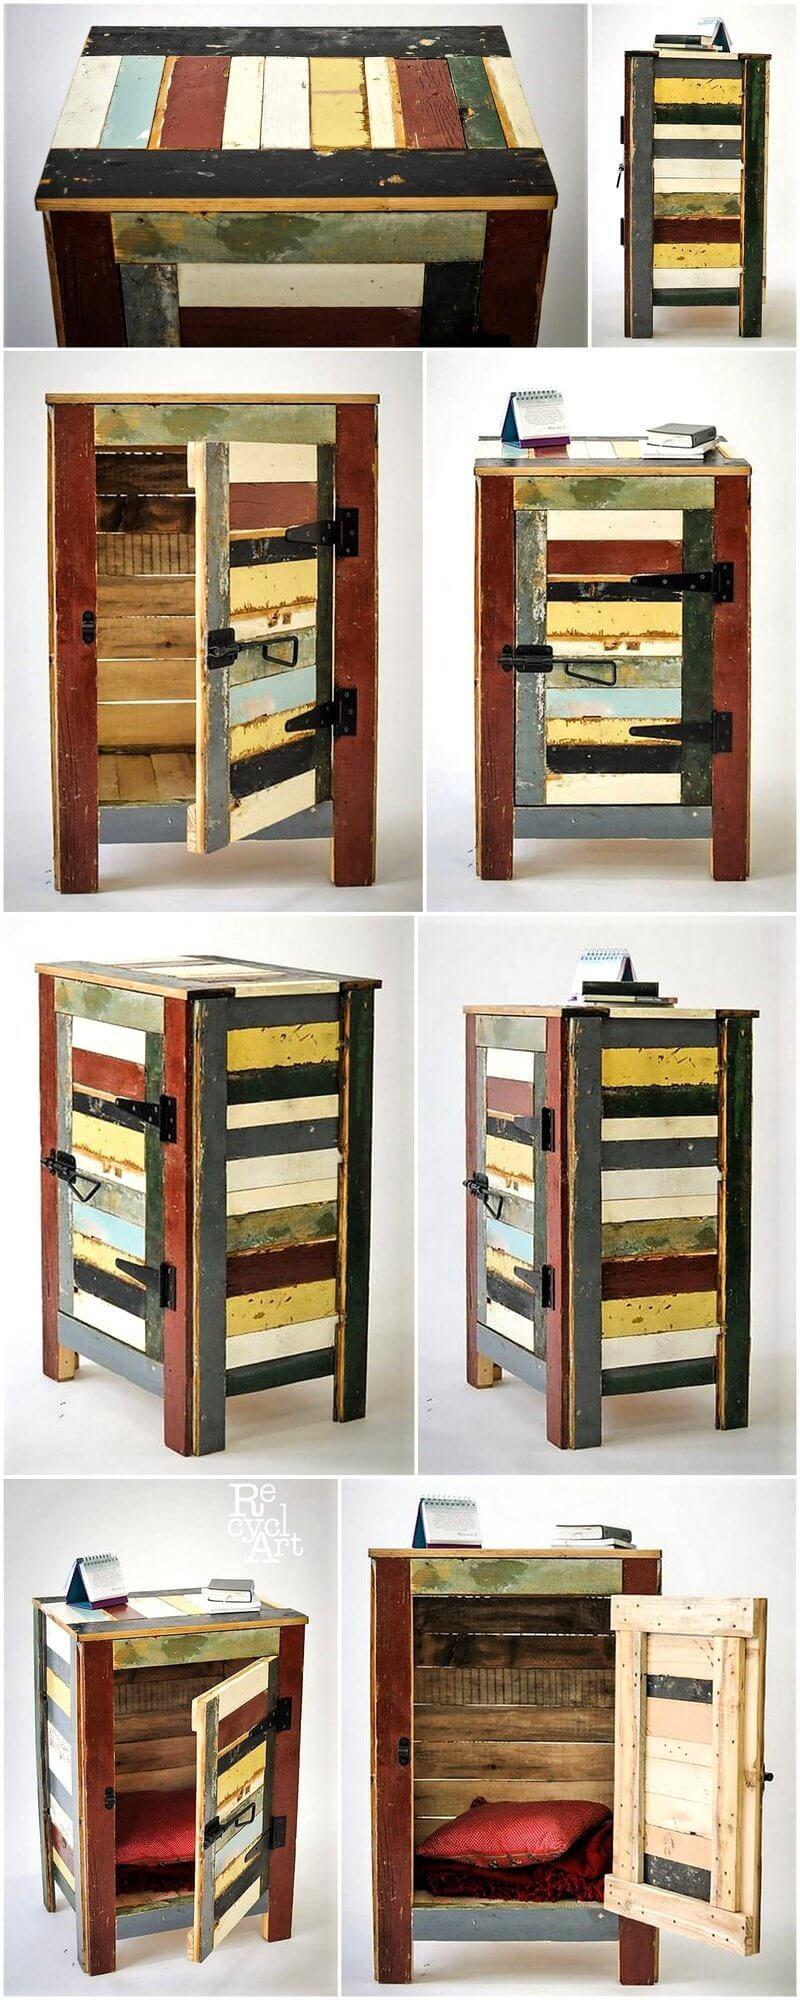 Wood Pallet Rustic Nightstand